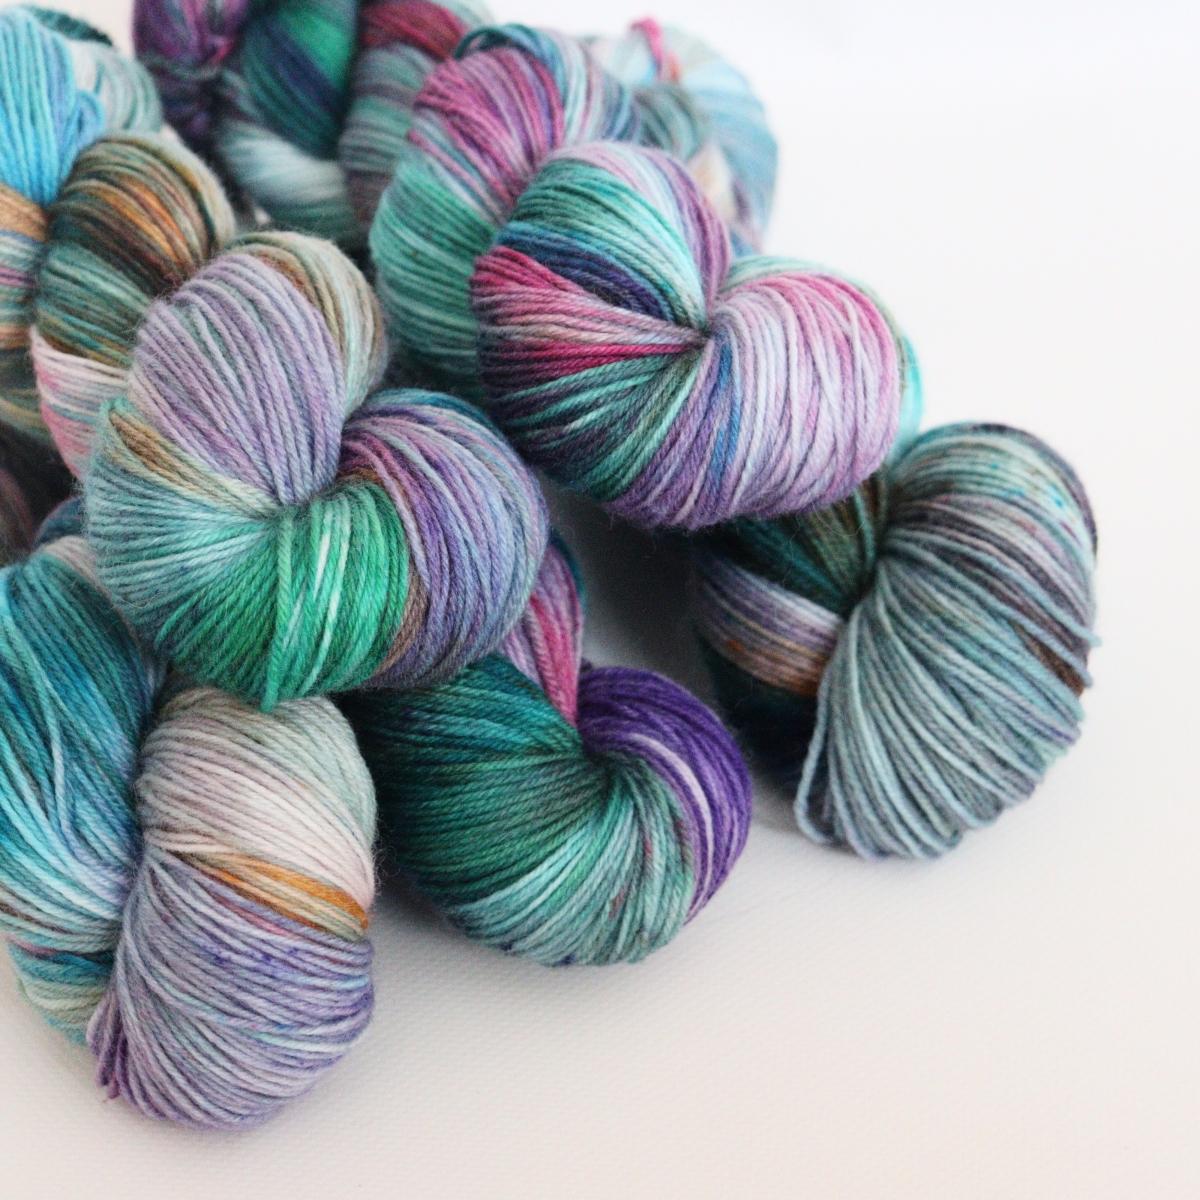 woodico.pro hand dyed yarn 058 2 1200x1200 - Hand dyed yarn / 058